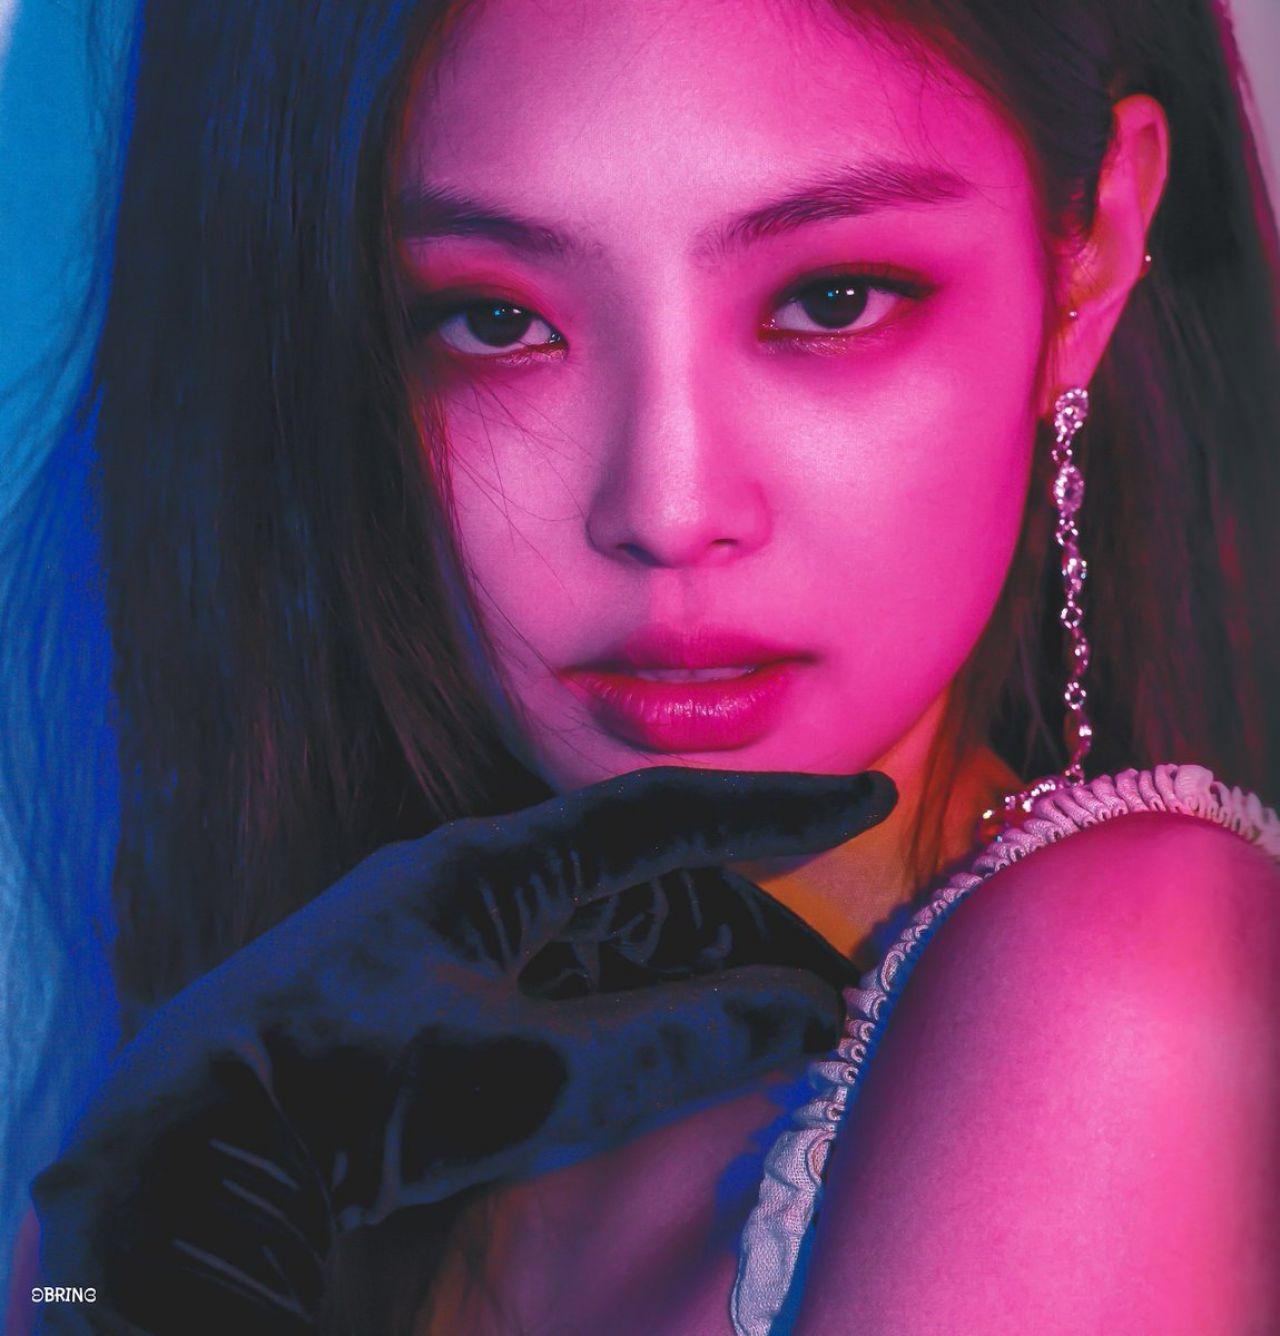 Blackpink - Blackpink In Your Area 1St Japanese Album -5818